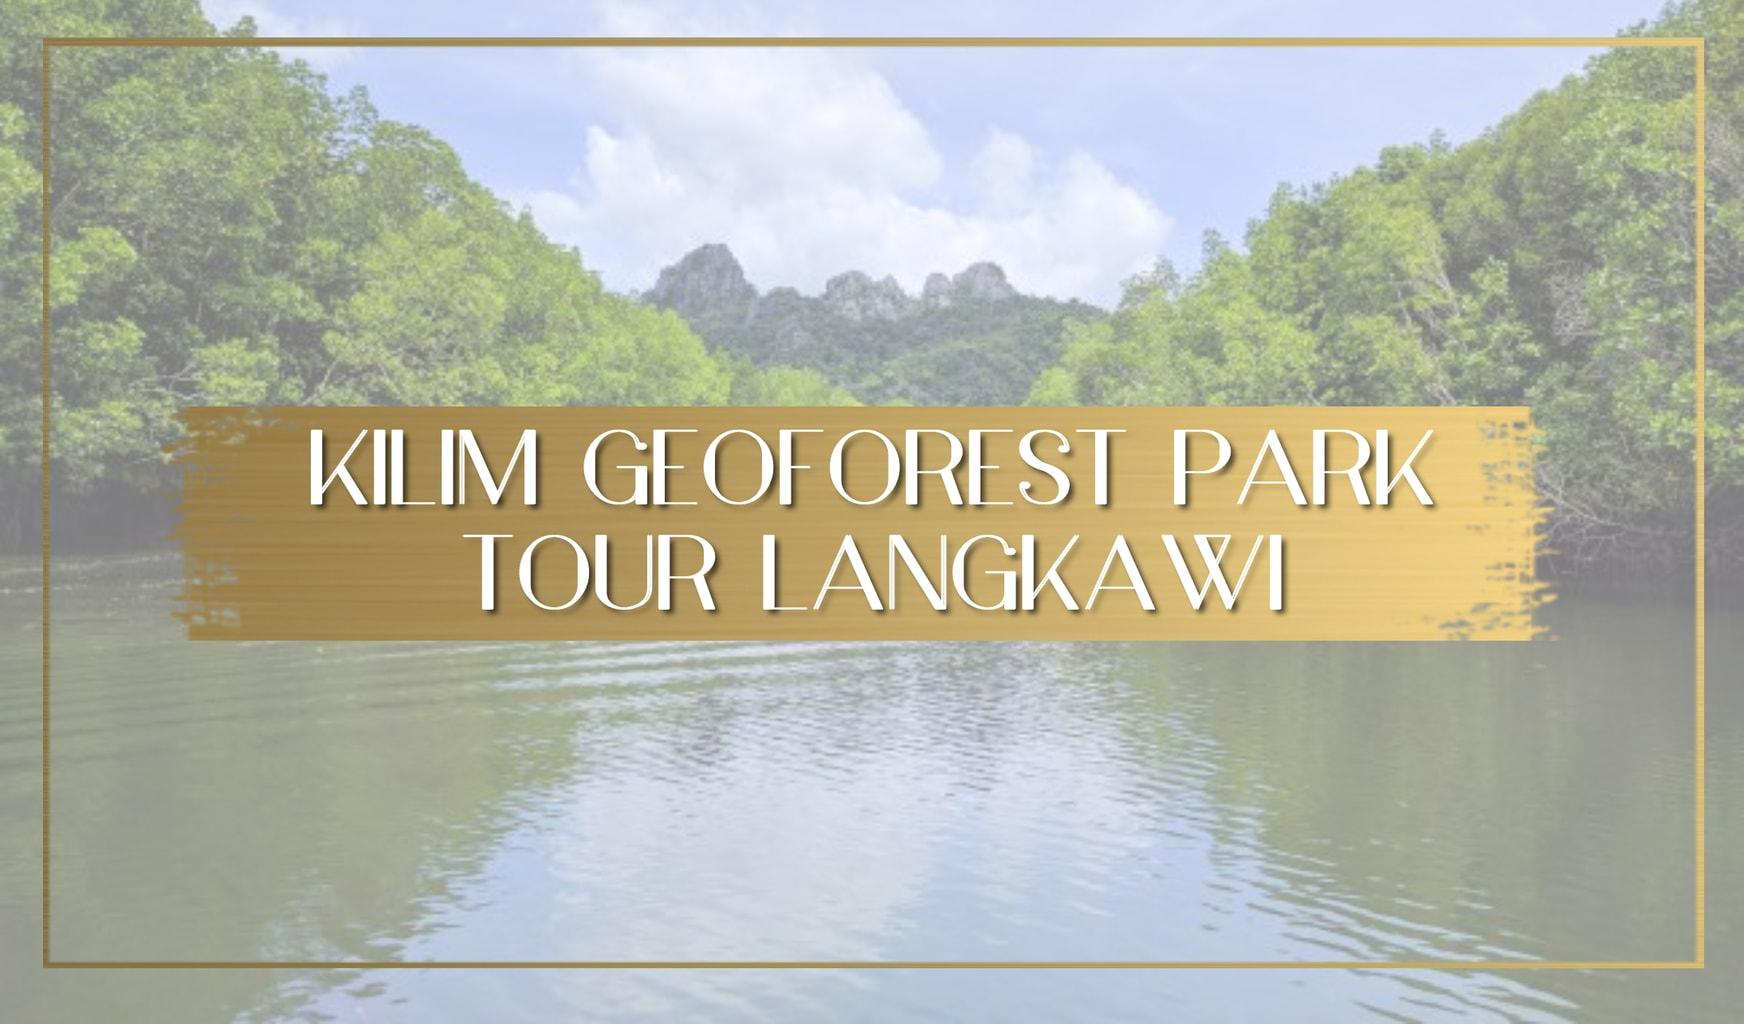 Kilim Geoforest Park Tour Langkawi Main